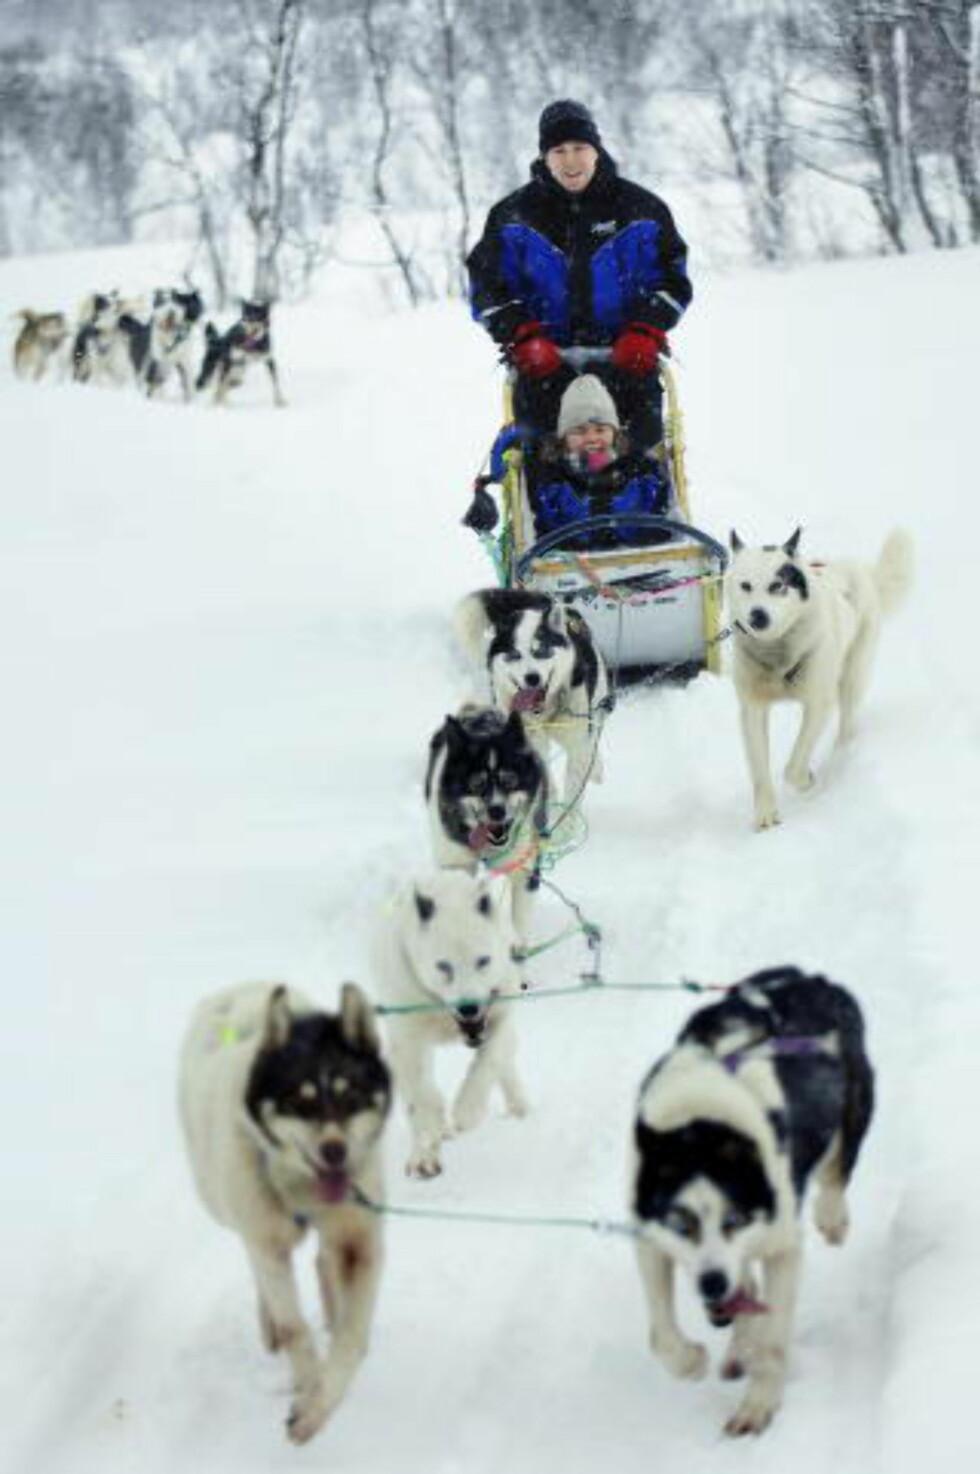 HUSKYTUR: Turister  på hundekjøring på Tromsø Villmarksenter. Foto: INGUN A. MÆHLUM